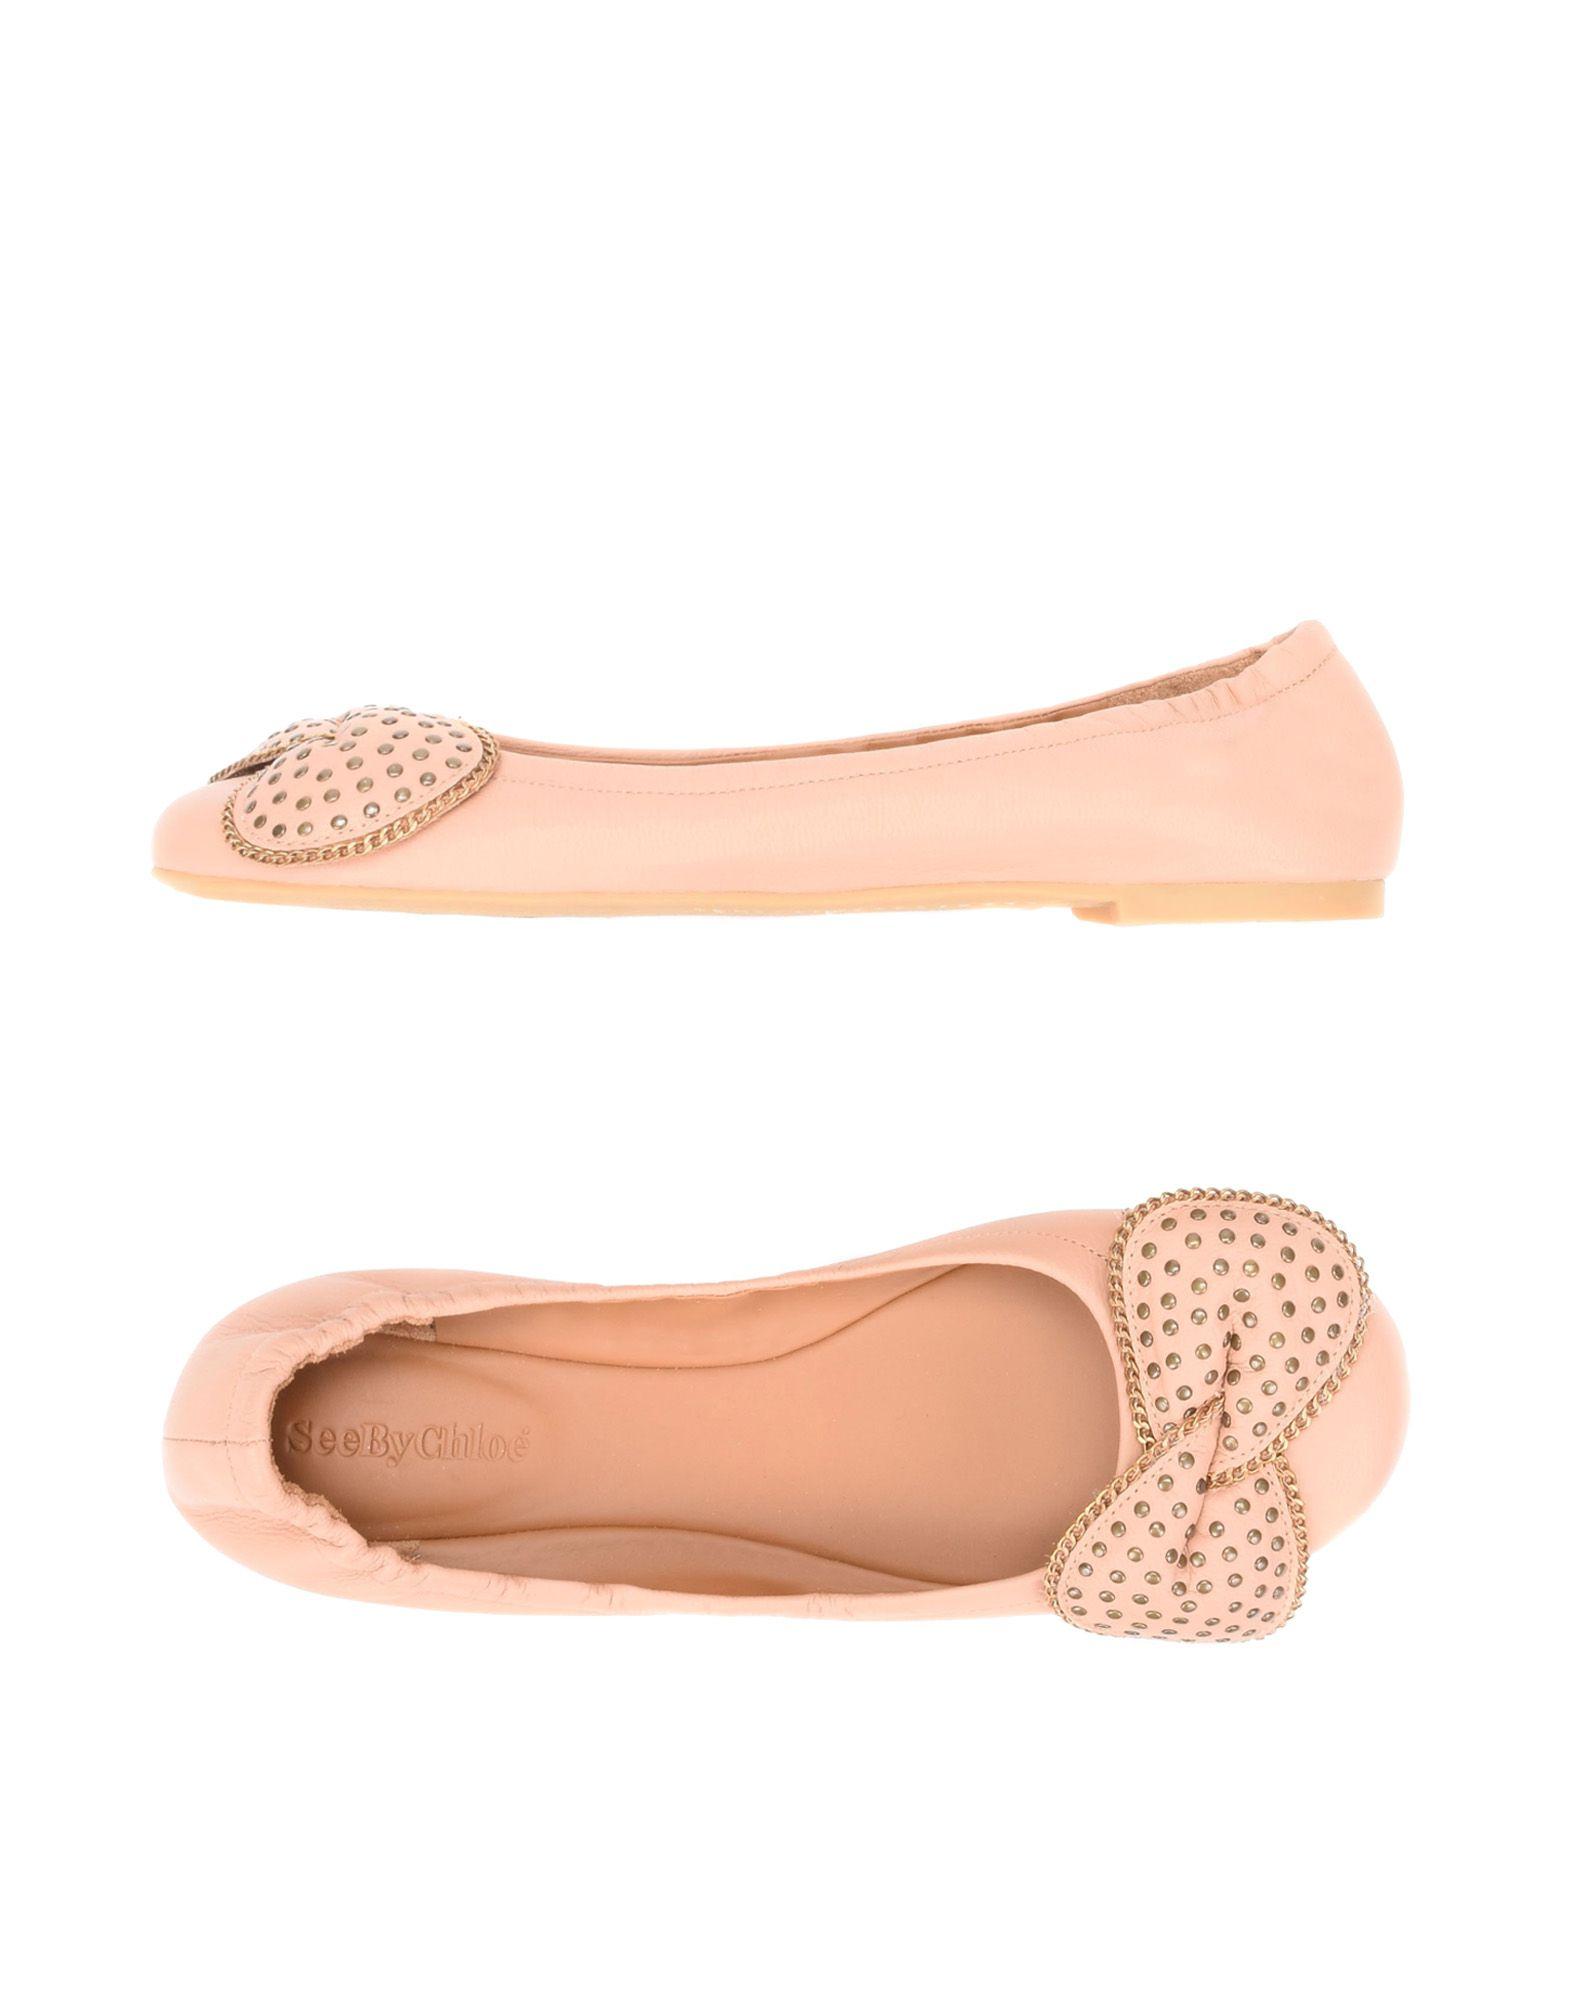 See By Chloé Schuhe Ballerinas Damen  11380348MD Neue Schuhe Chloé da0f46